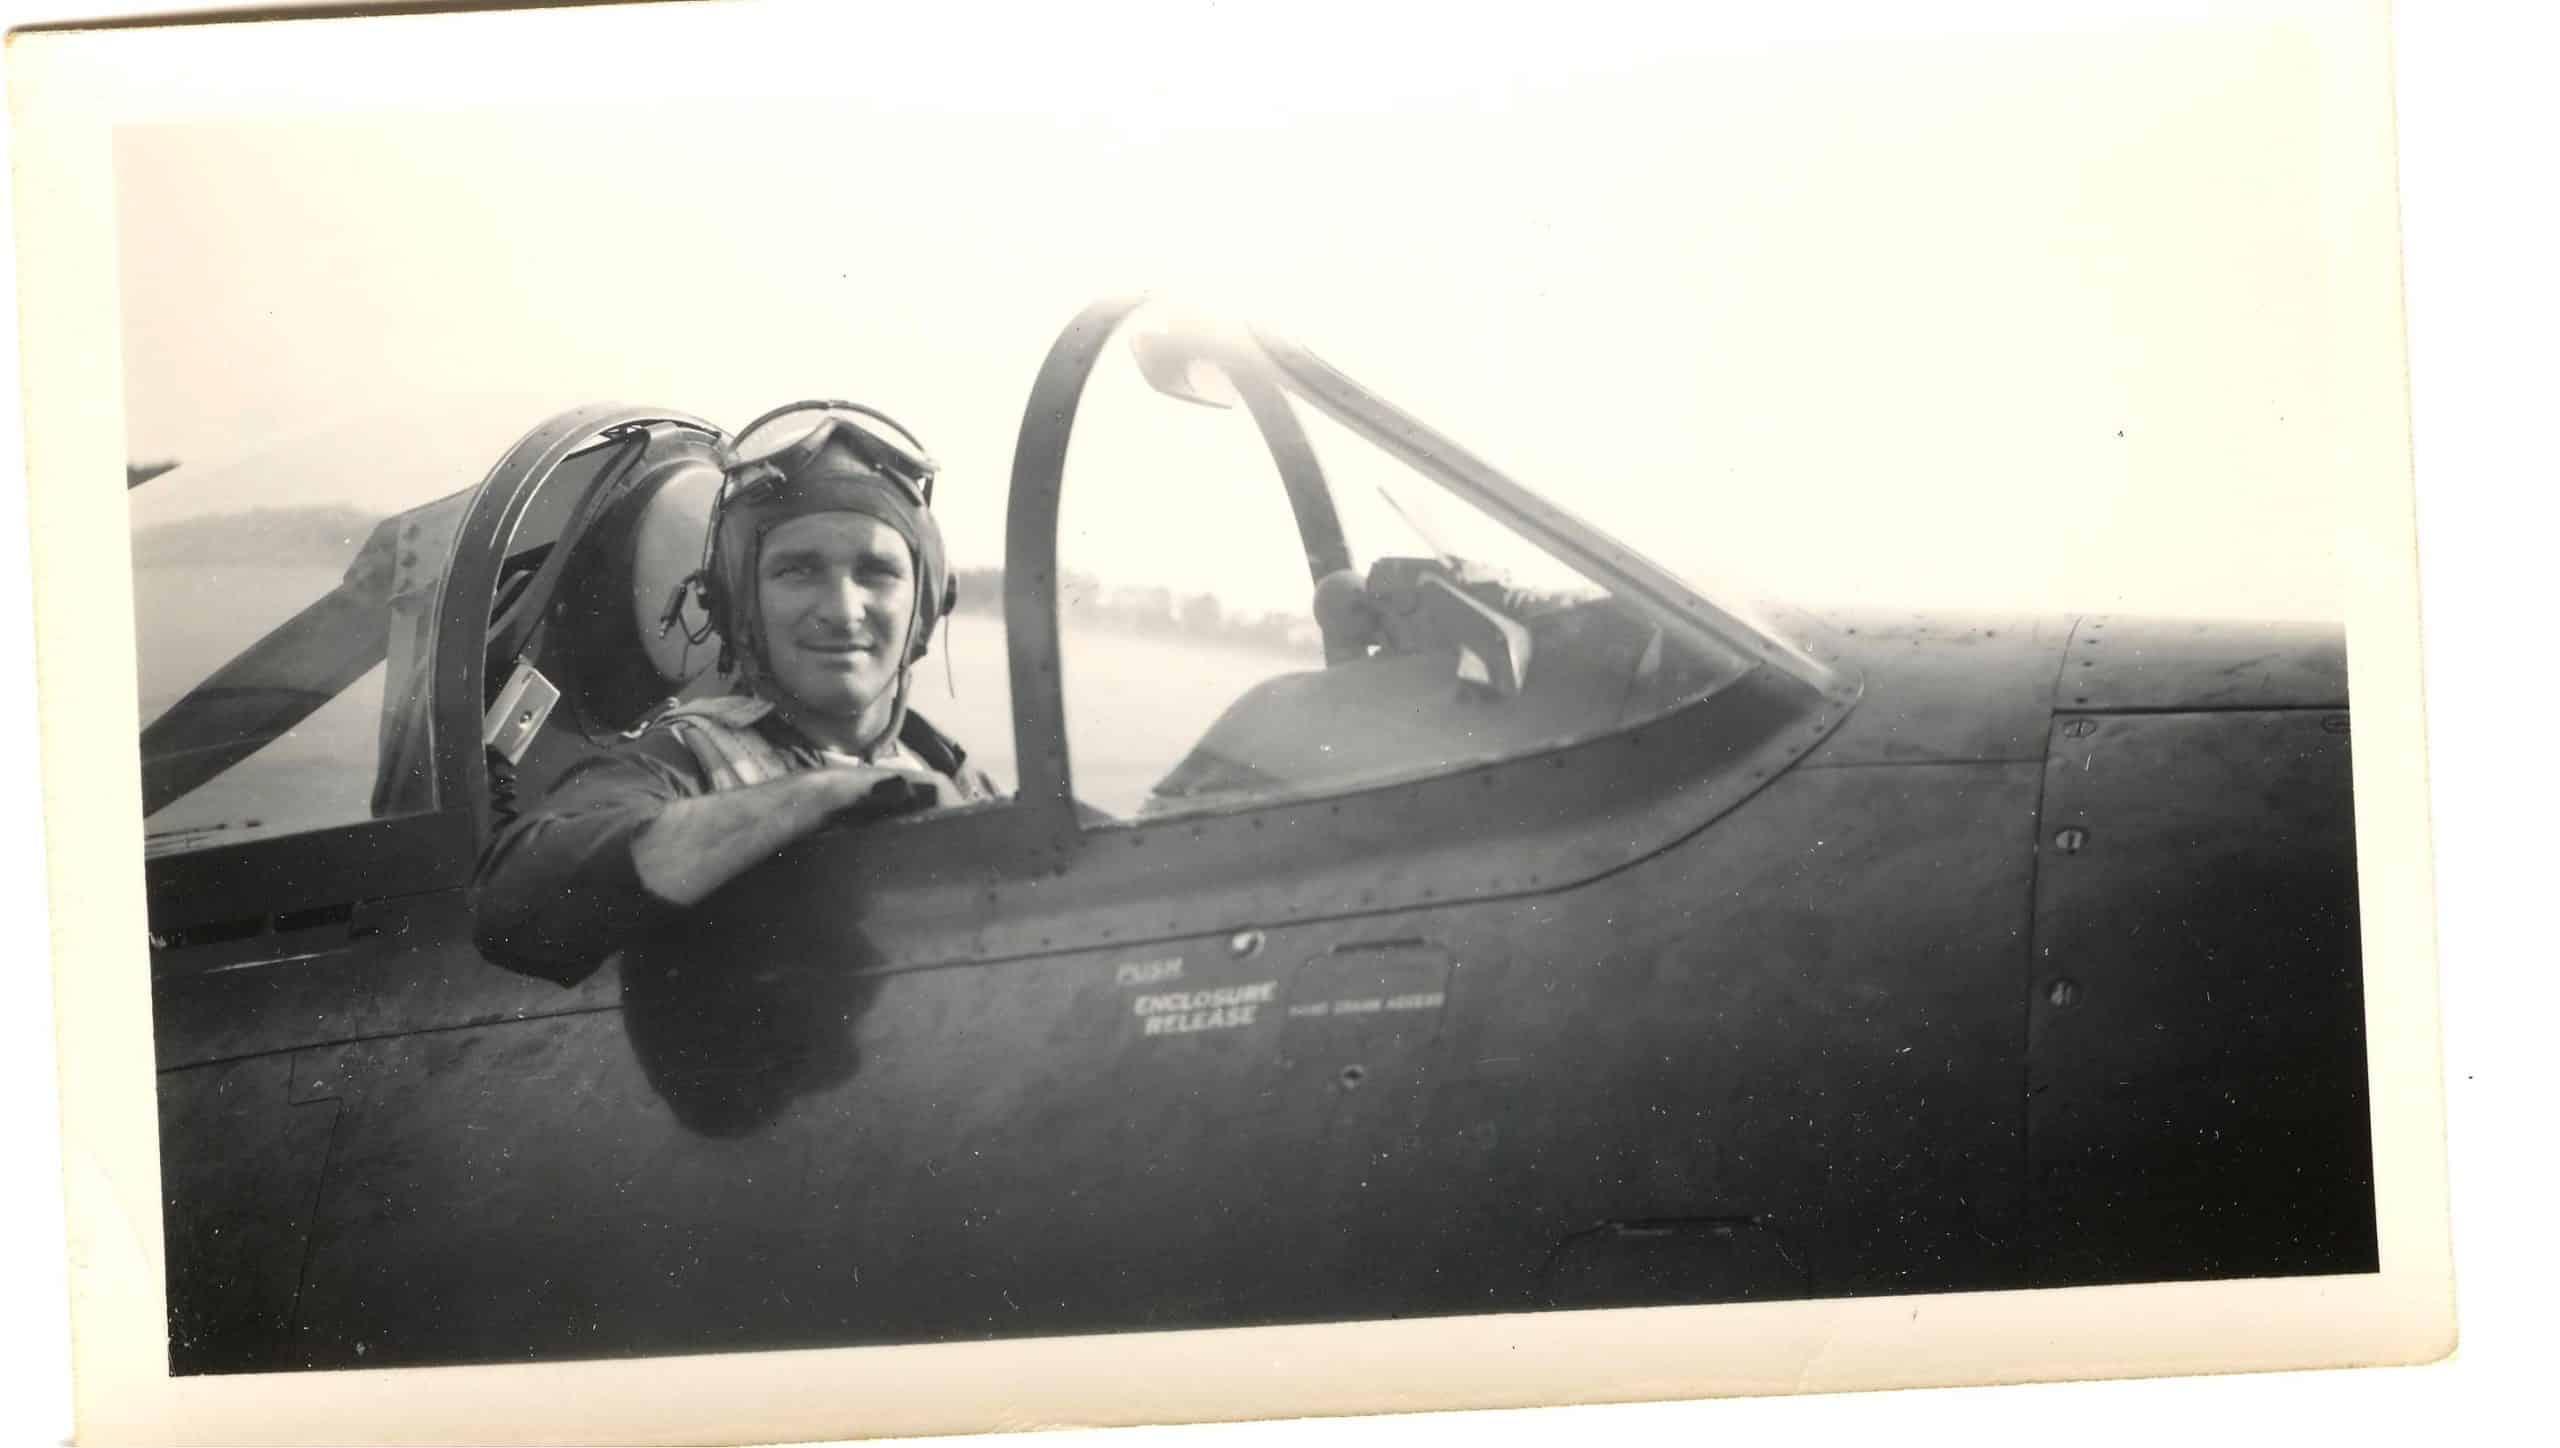 Commander W. T. Spriegel in his Navy plane